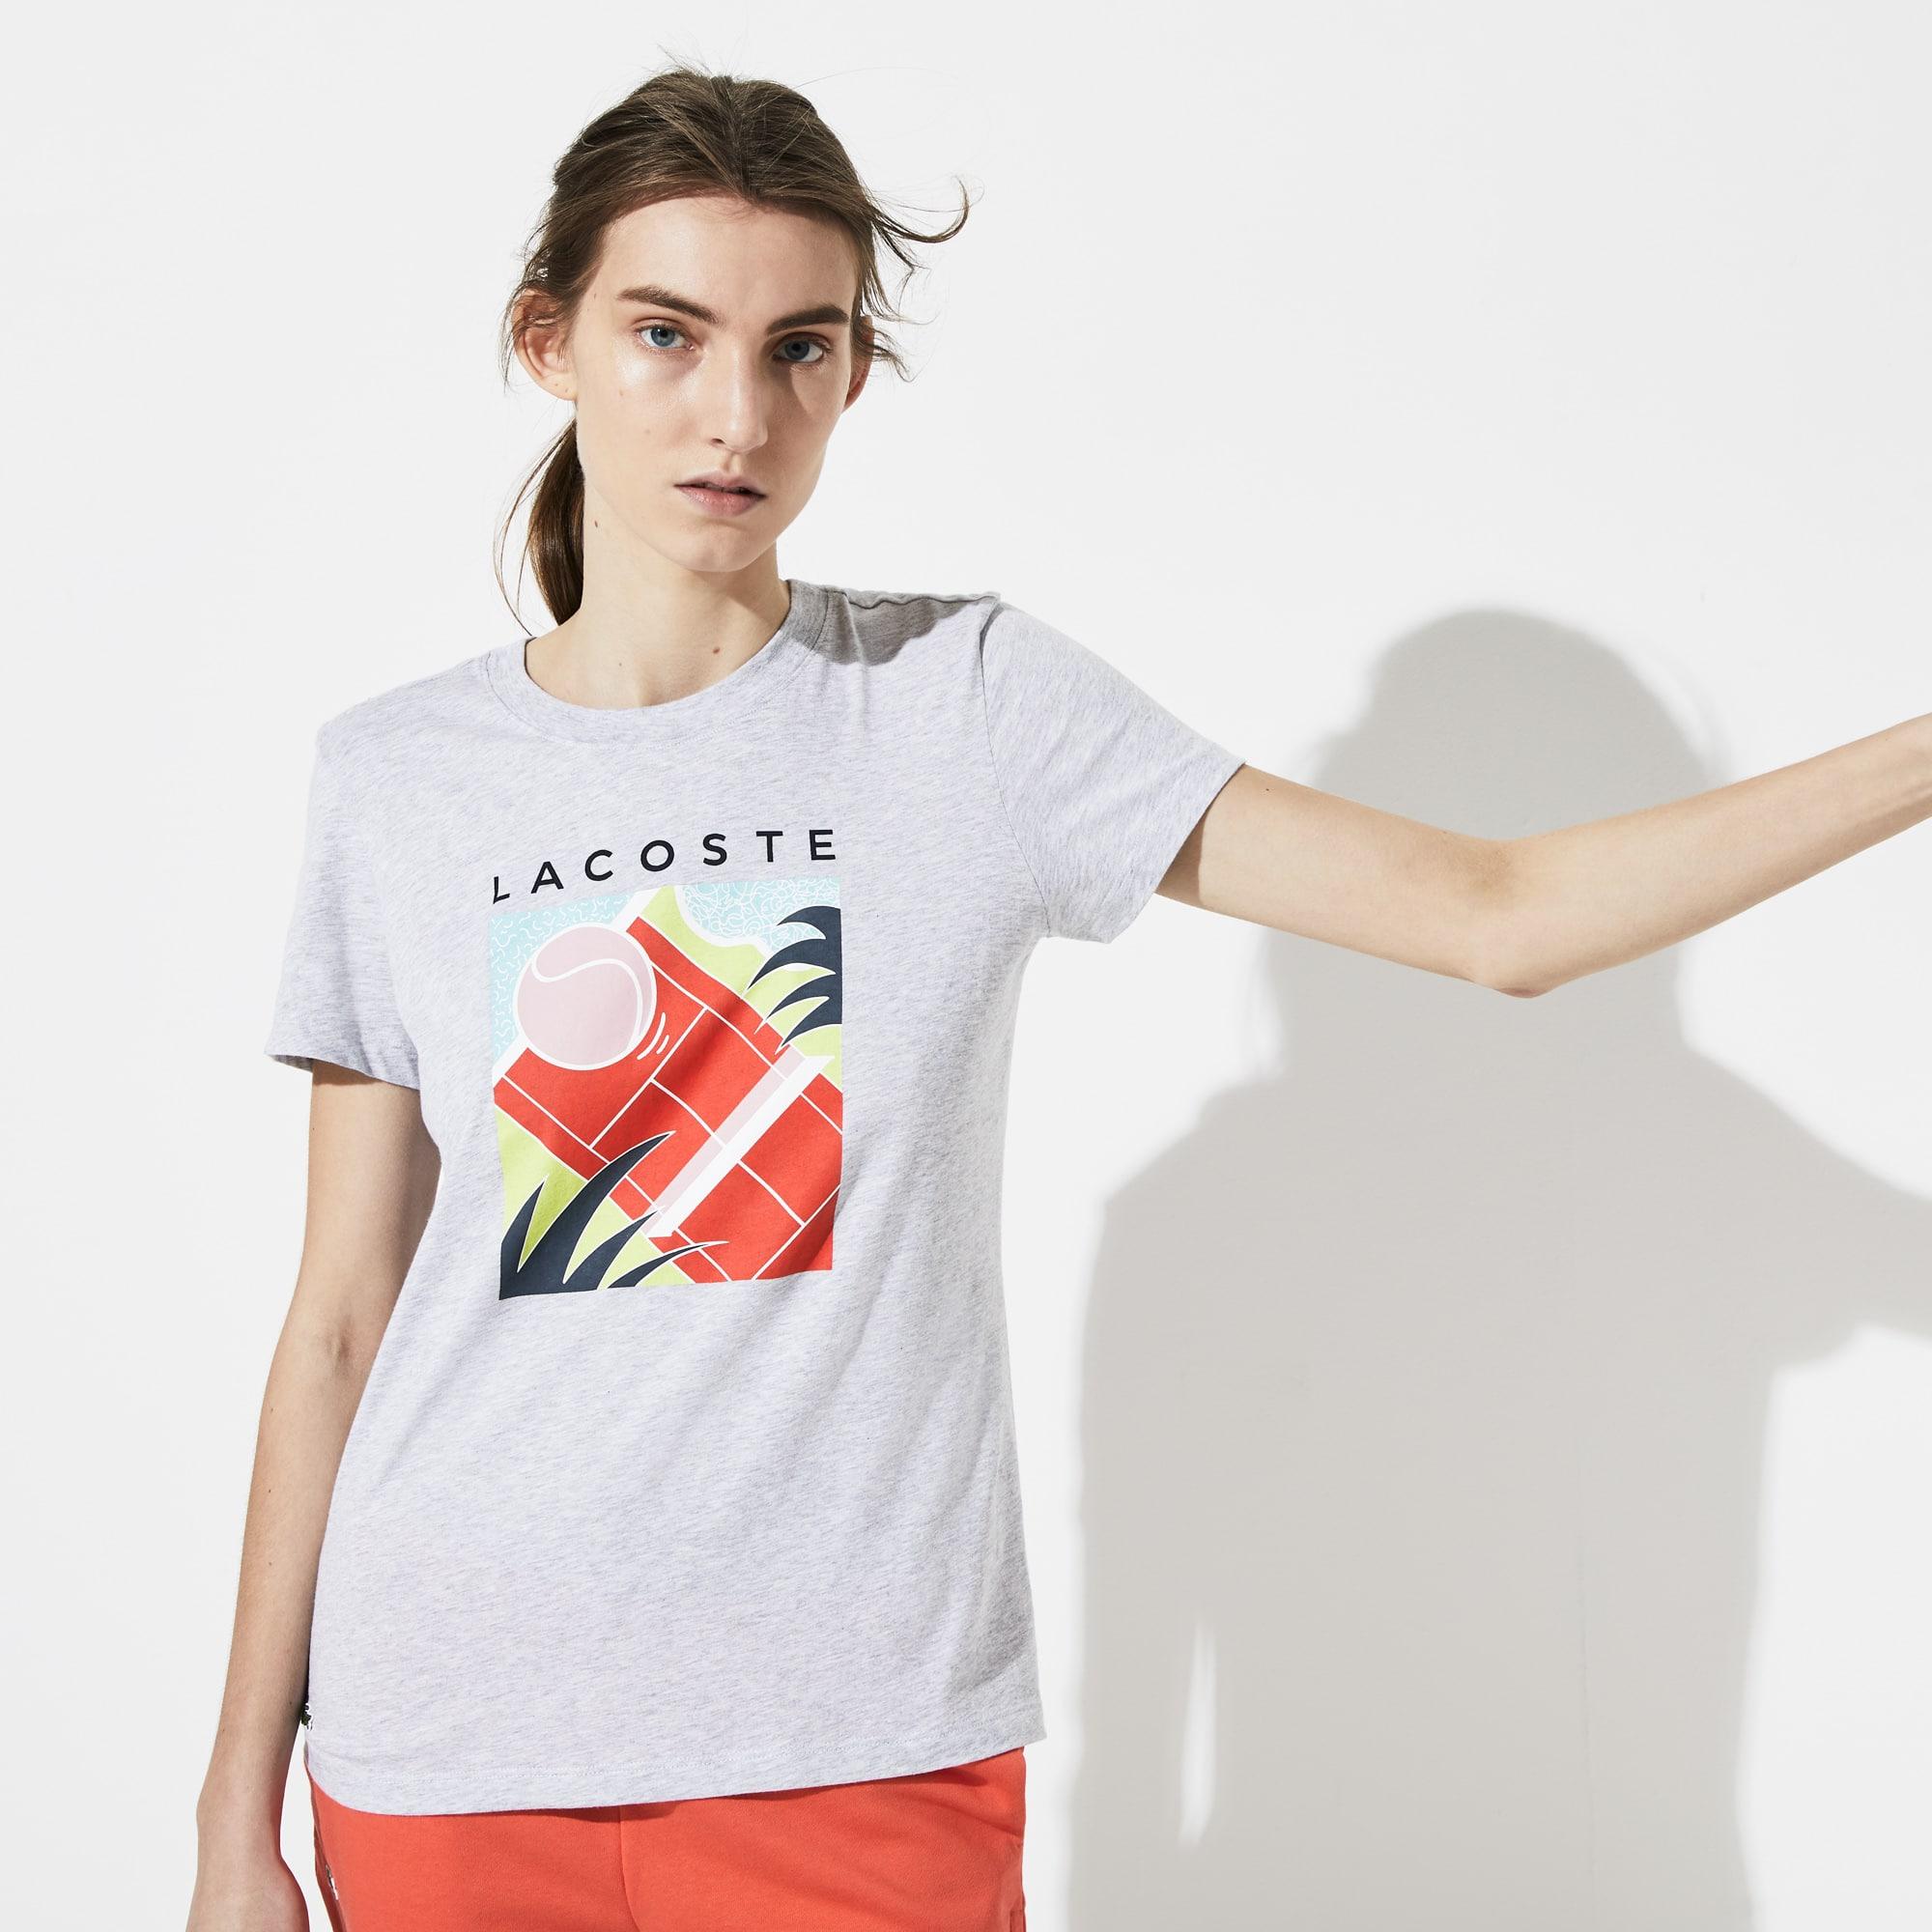 3b7a80ee Women's Lacoste SPORT Crew Neck Print Flowing Cotton Tennis T-shirt |  LACOSTE